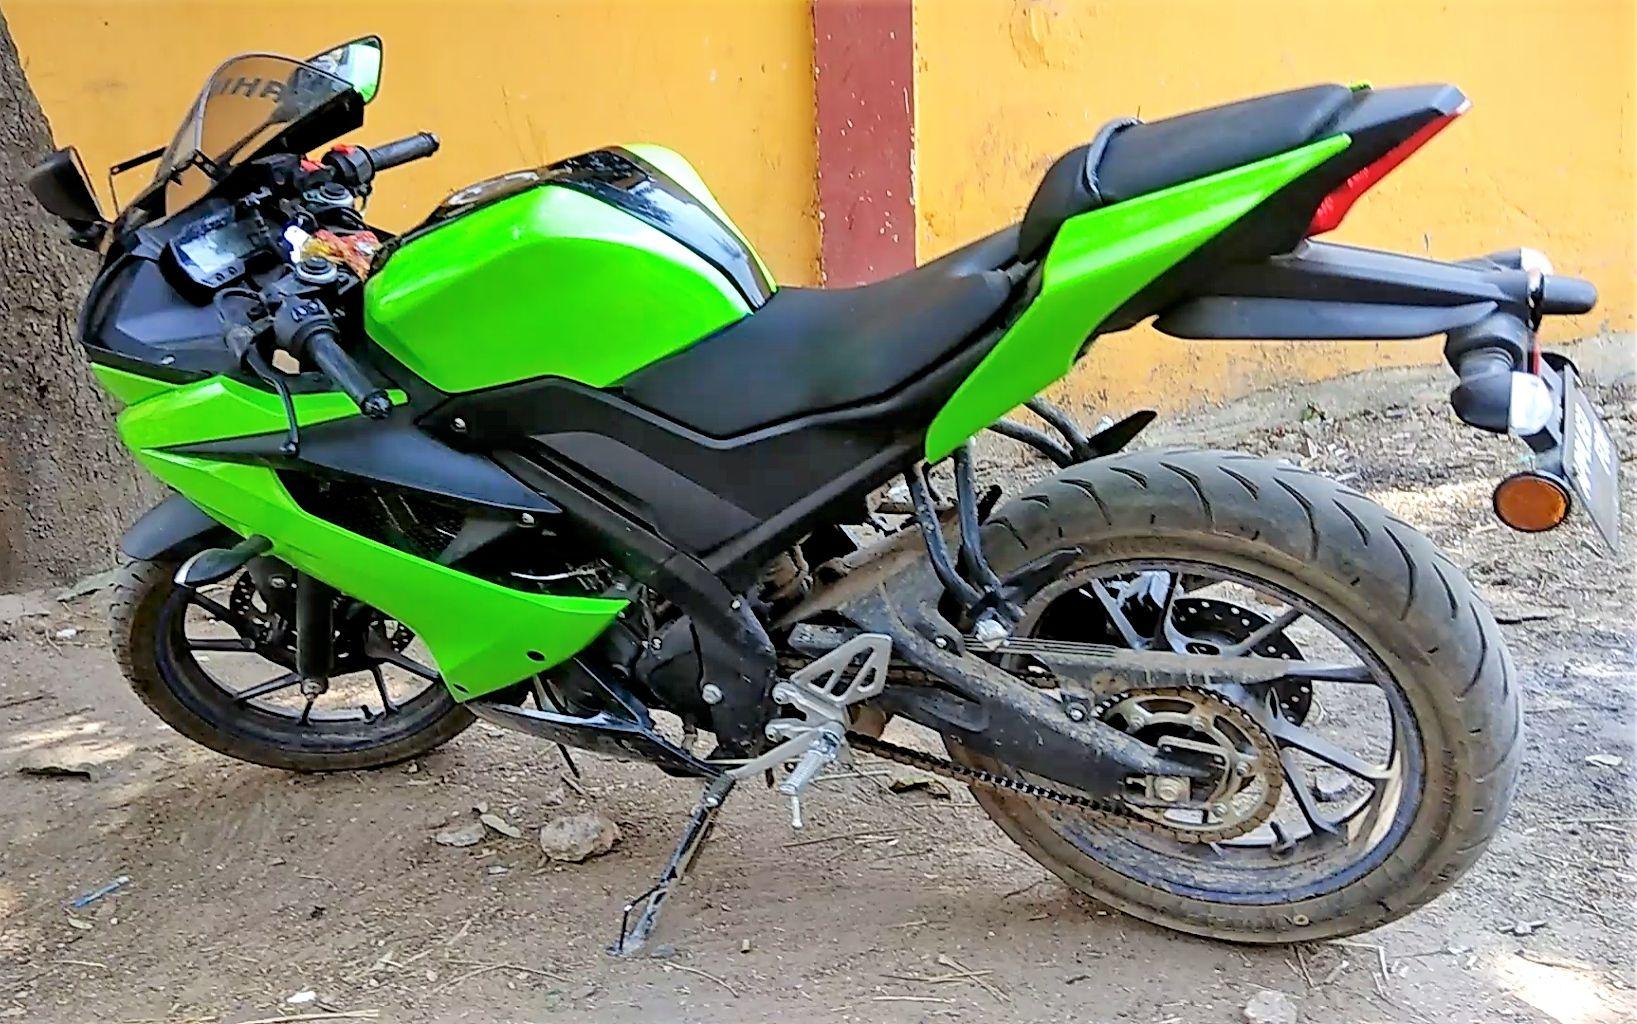 Yamaha R15 V3 Ninja Green Wrap By Misty Stickers (Patna) | Maxabout